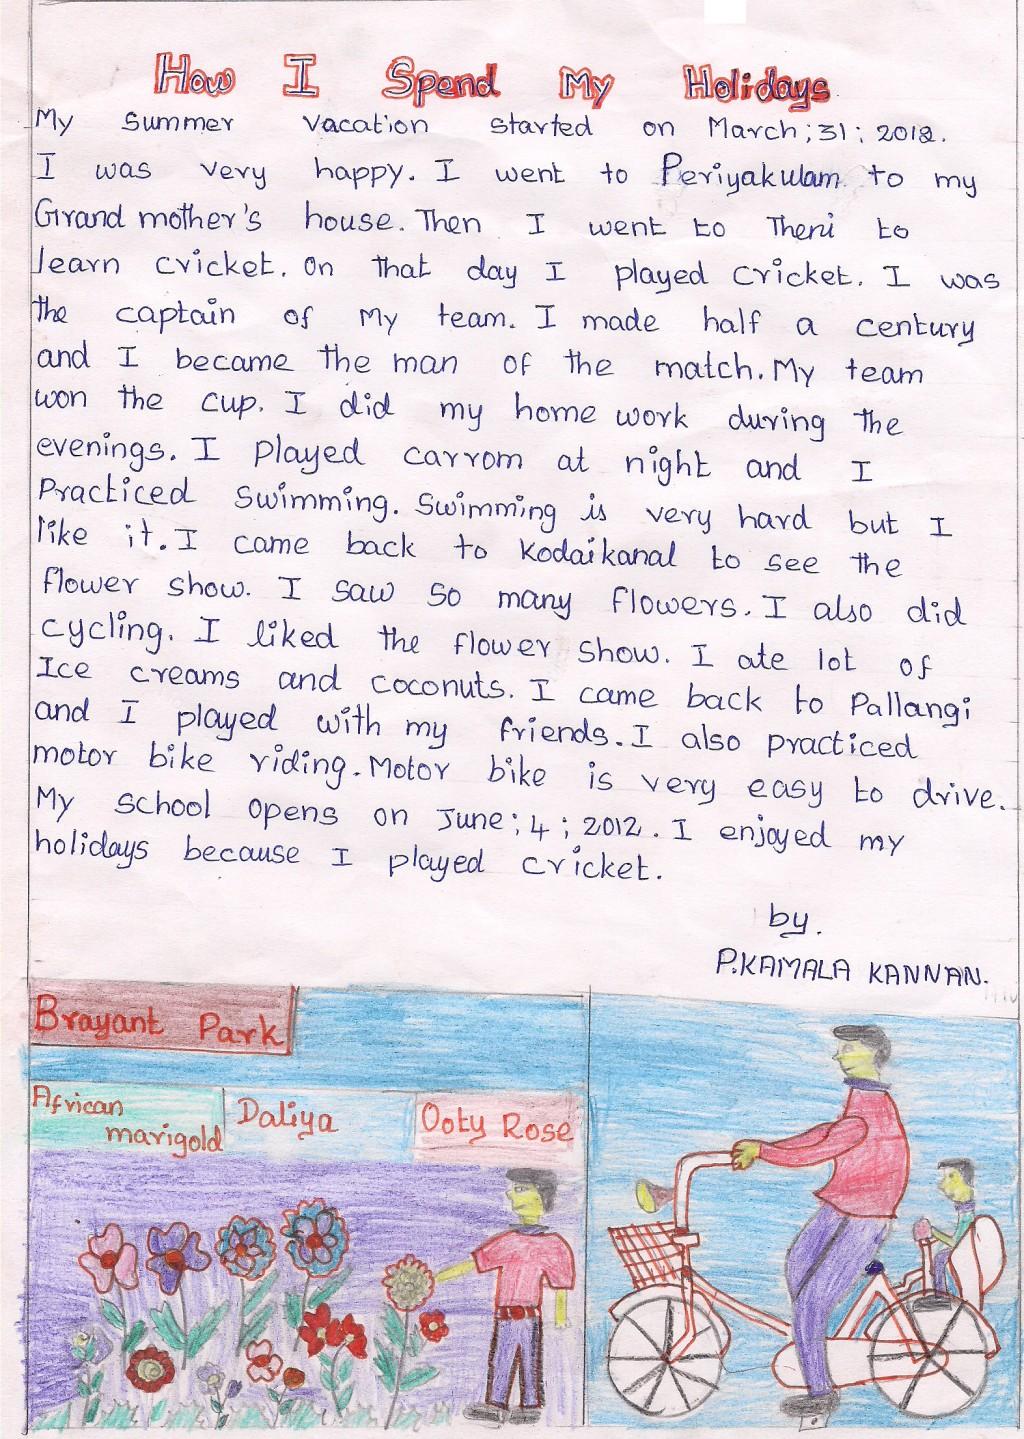 022 Summer Vacation Essay Frightening For Class 6 In Urdu On Marathi Large